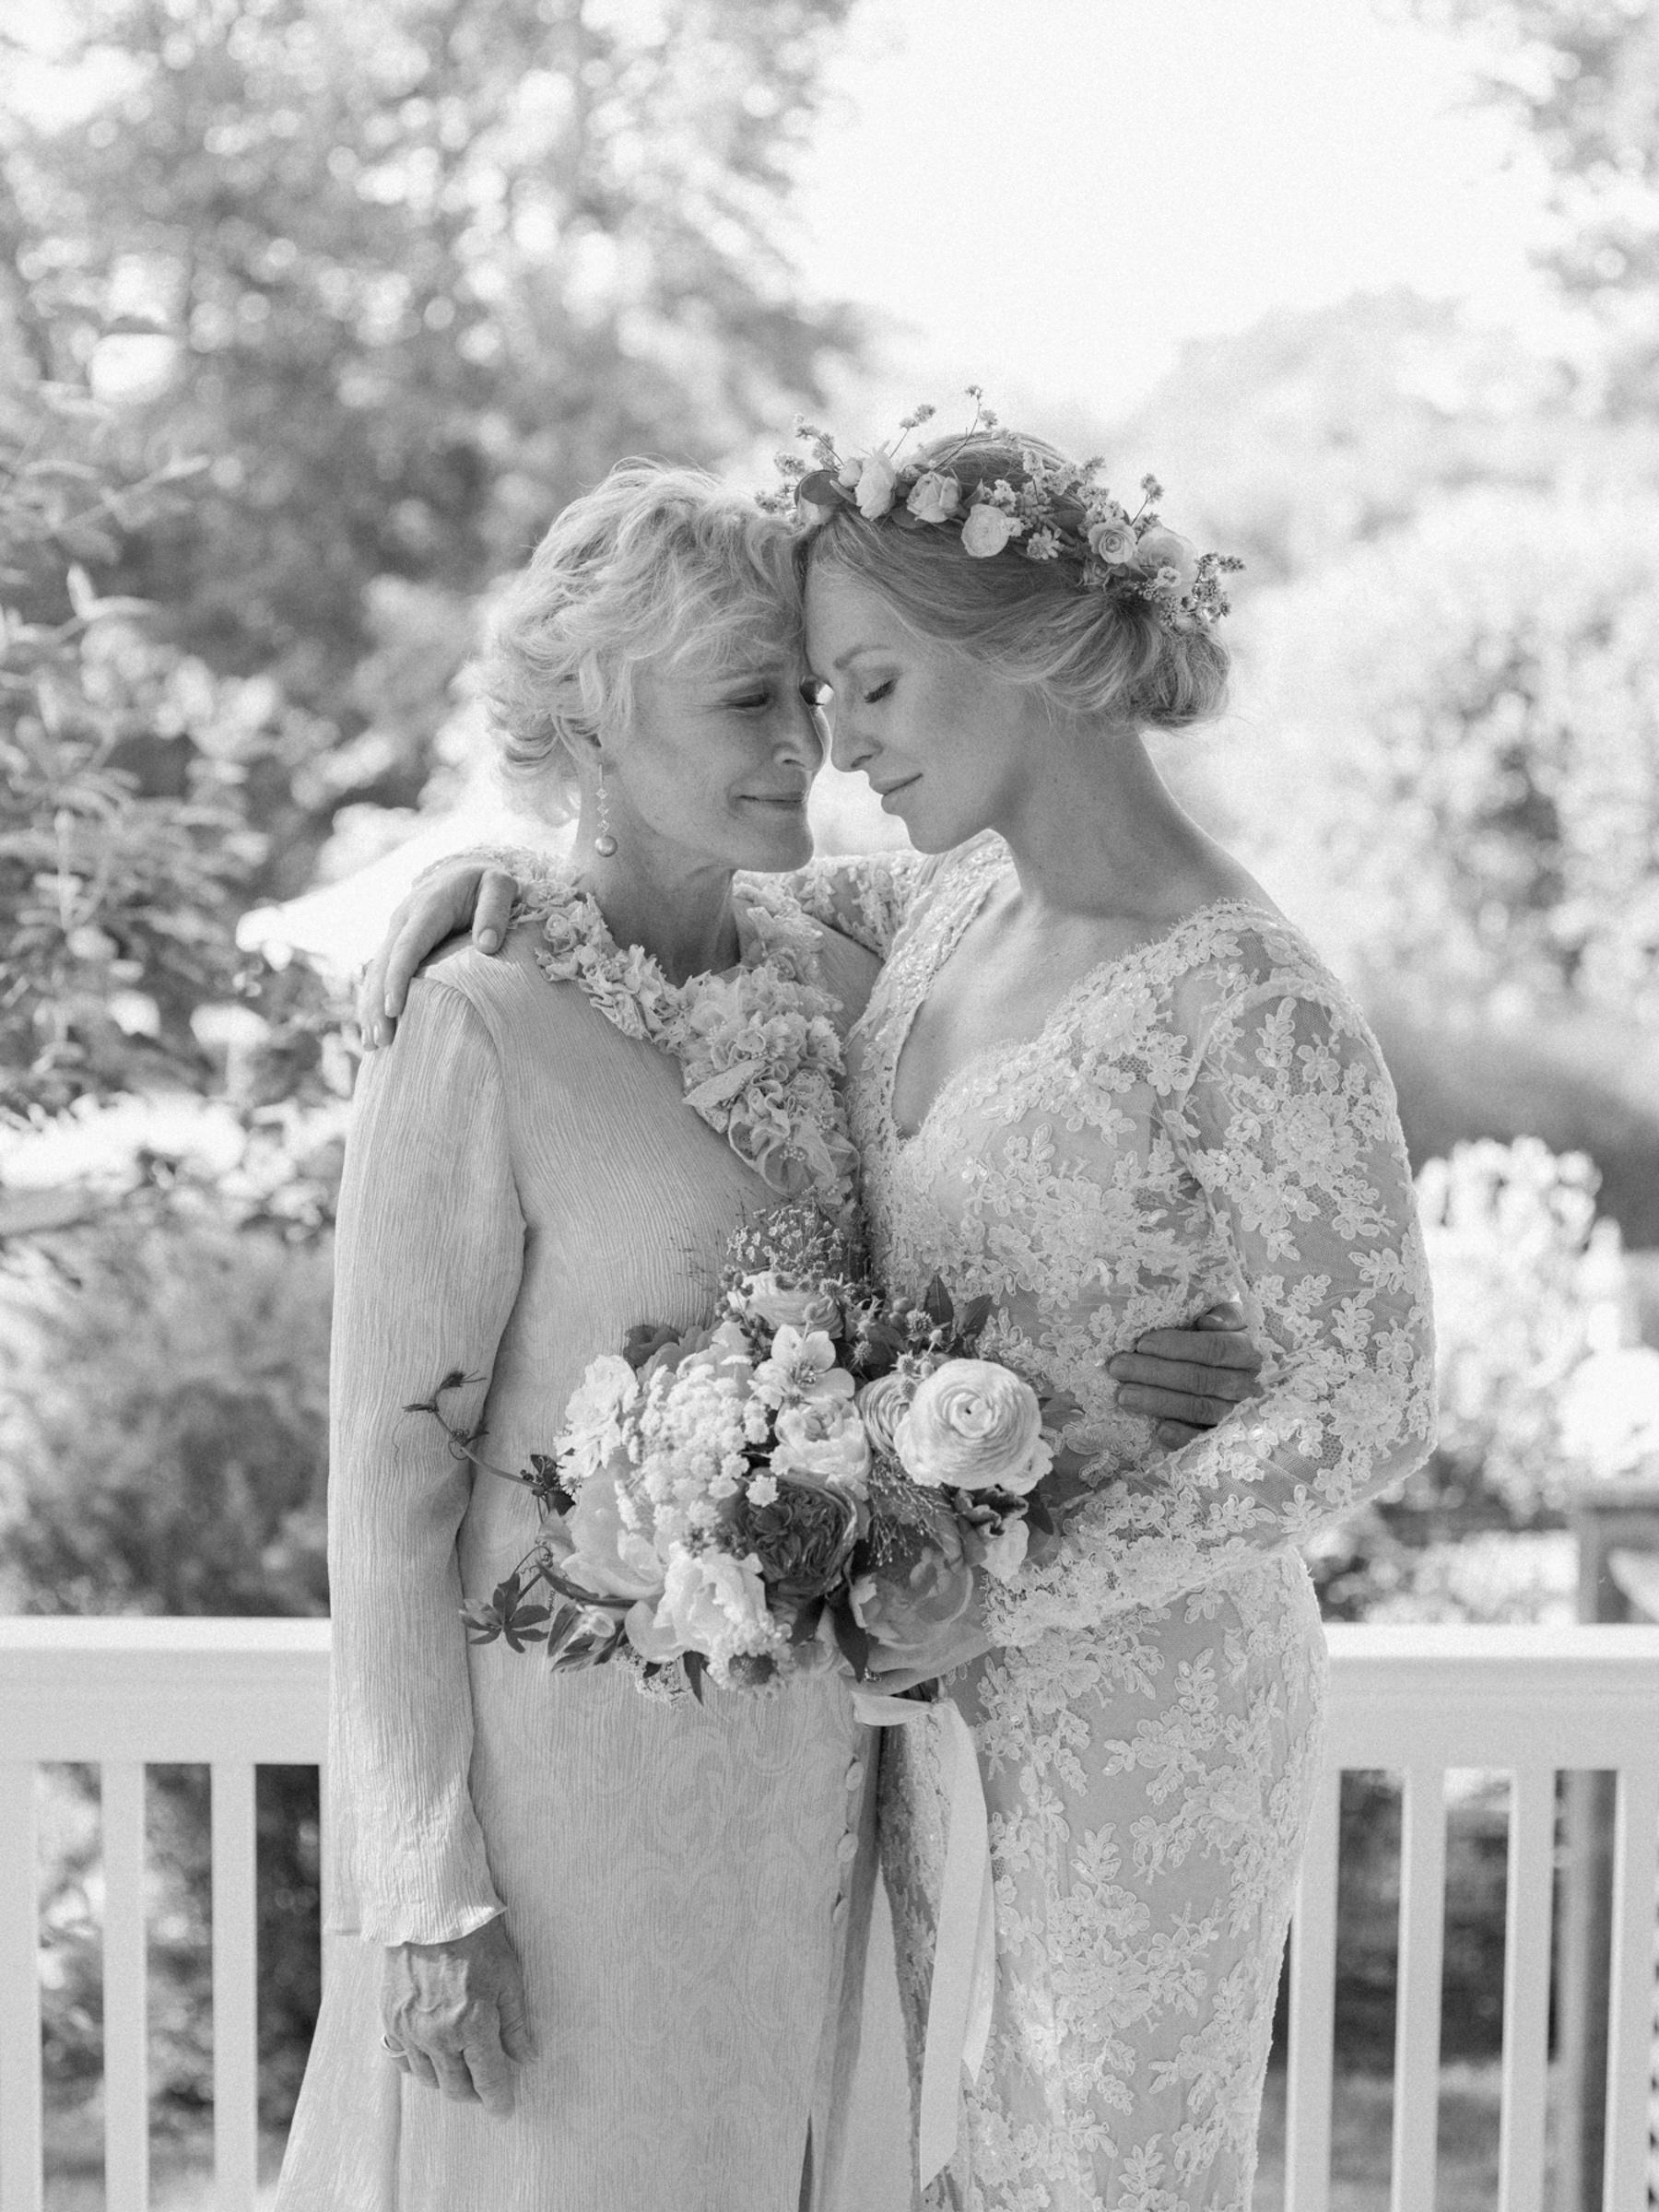 lovely-portrait-of-glenn-close-with-her-daughter-at-wedding-photo-by-corbin-gurkin-worlds-best-wedding-photos